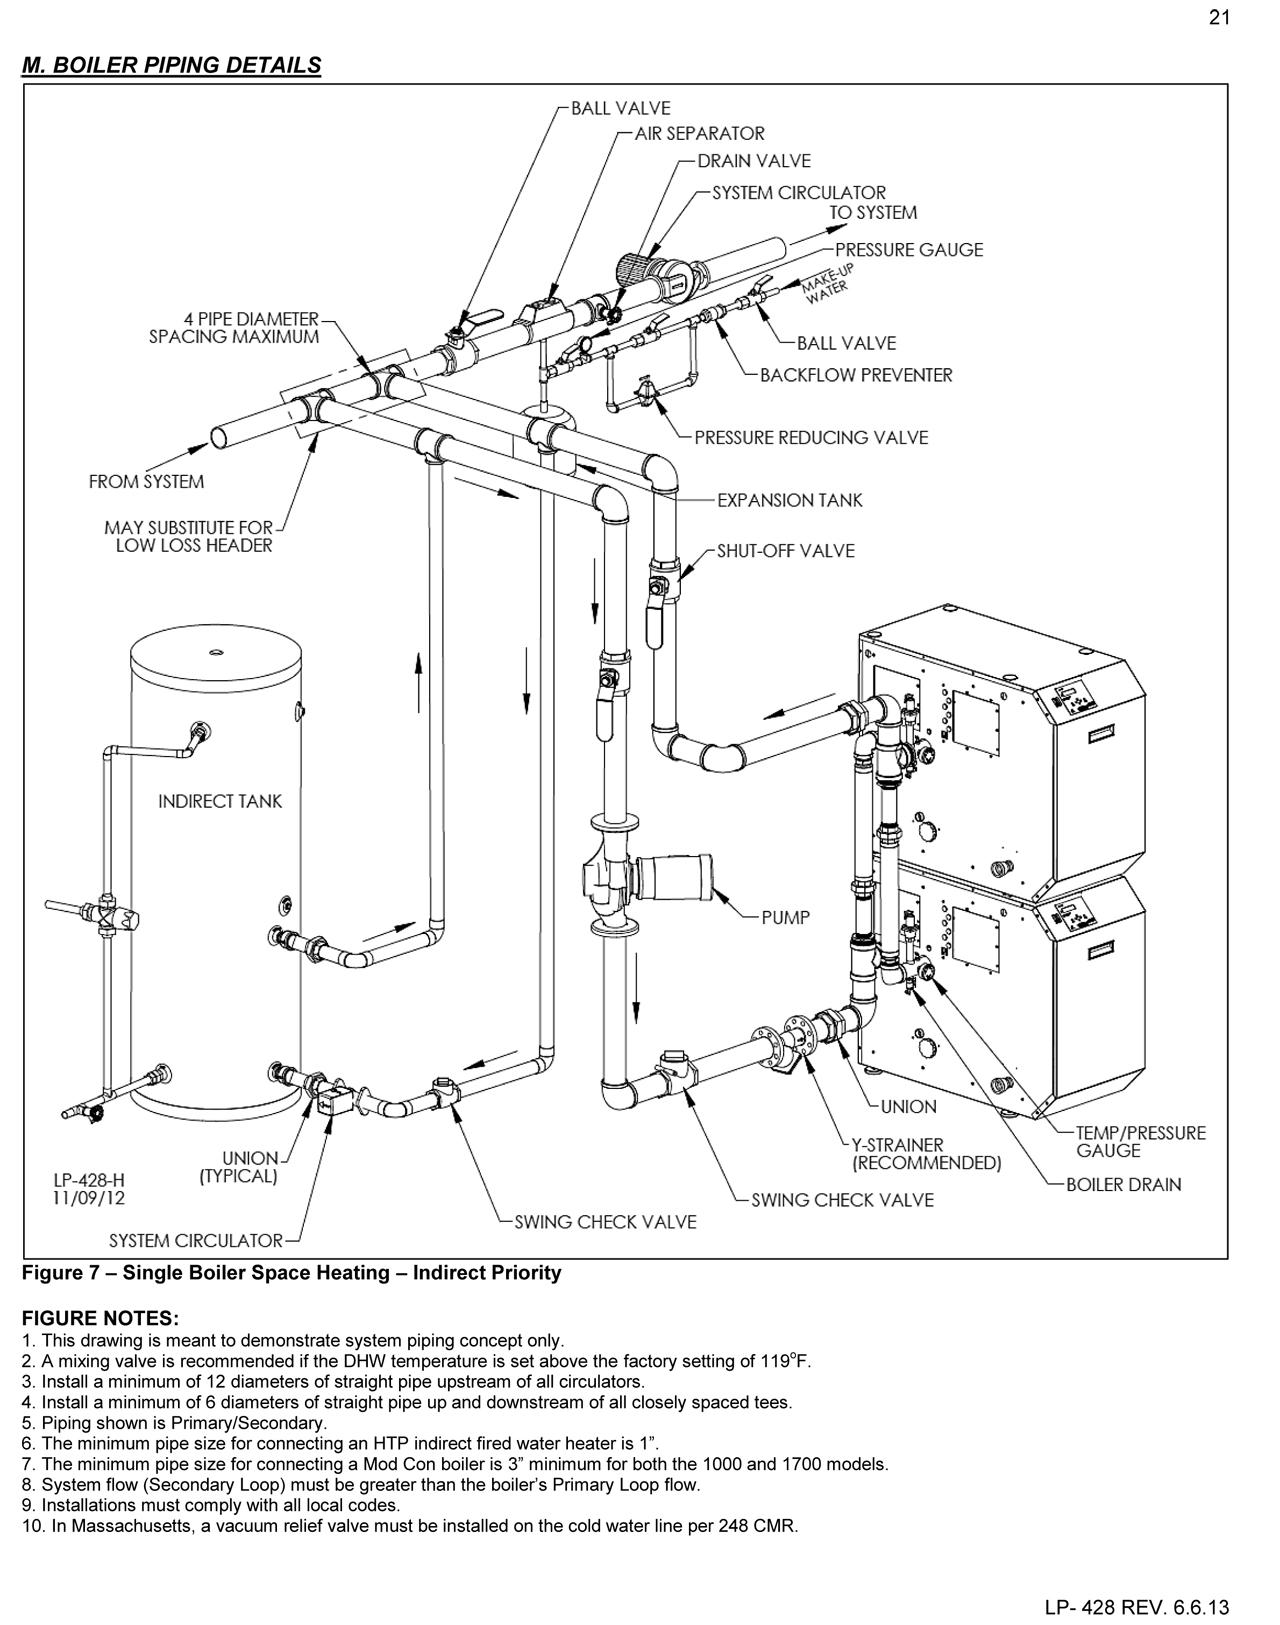 Mod Con Double Stack Commercial Gas Boiler Installation